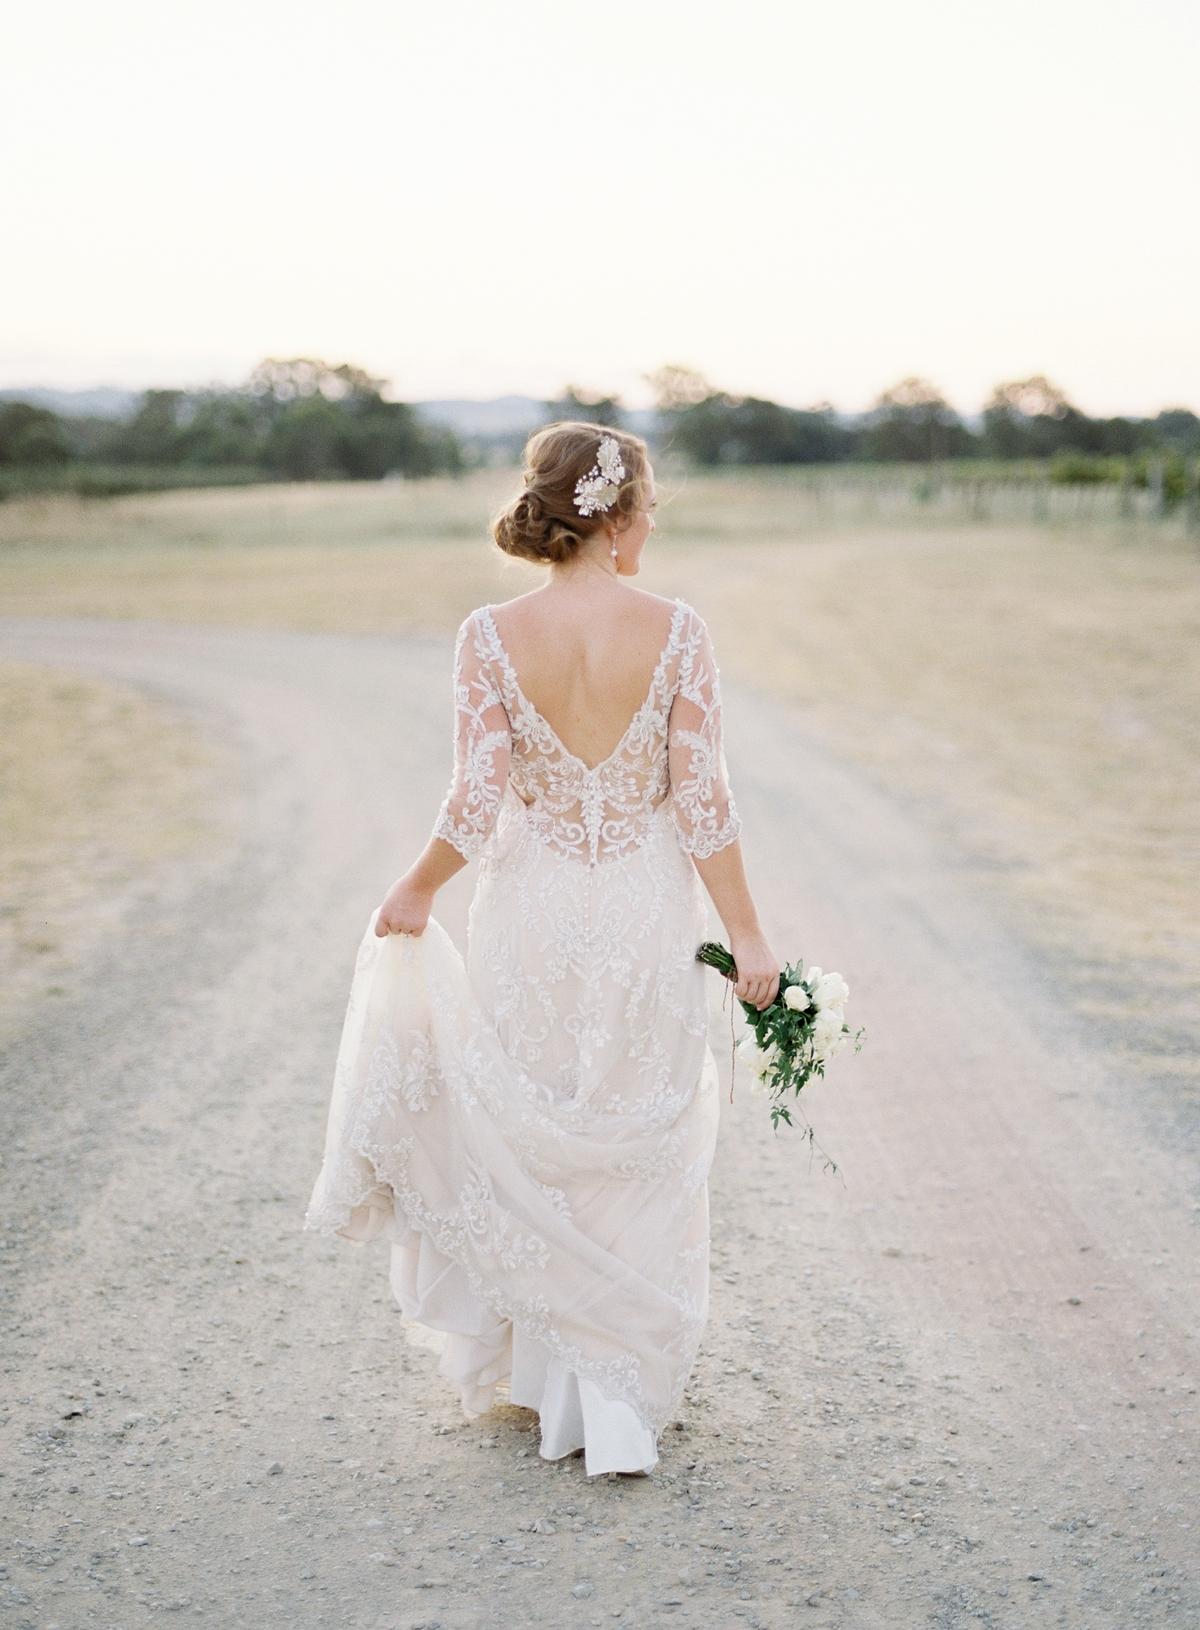 The Vine Grove Mudgee Wedding, Photography by Mr Edwards_1828.jpg